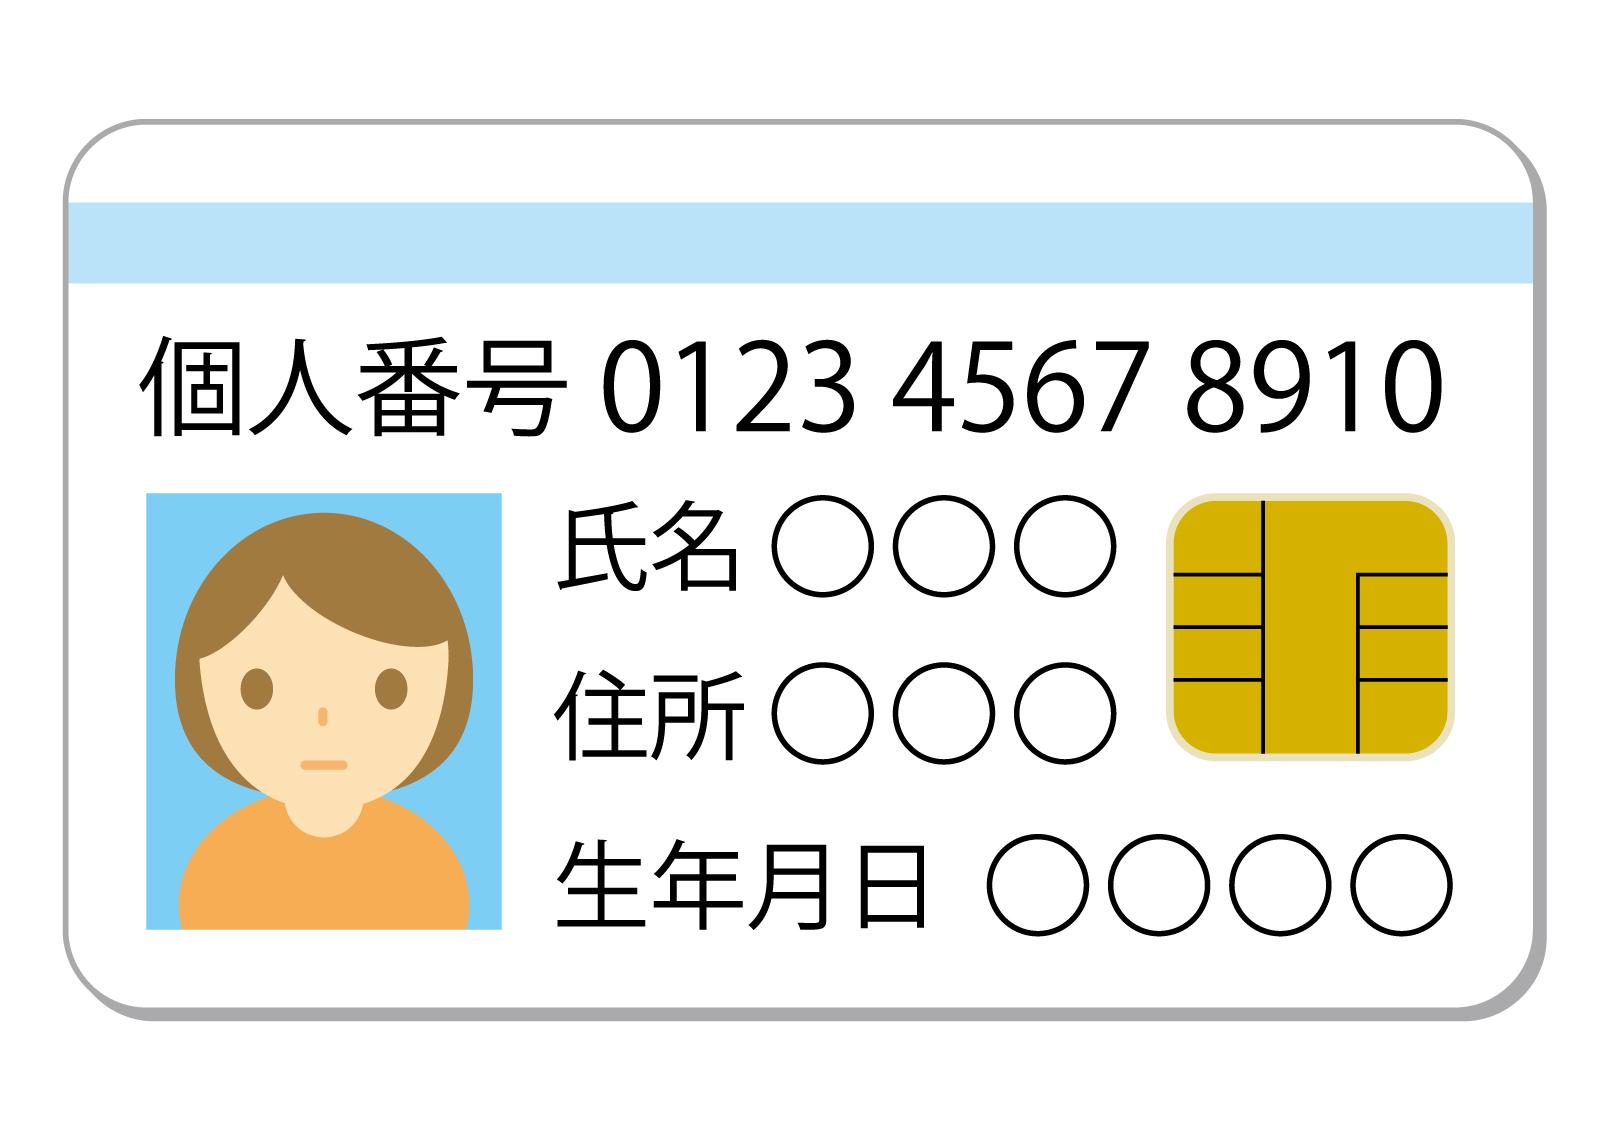 mynumber_card_.jpg